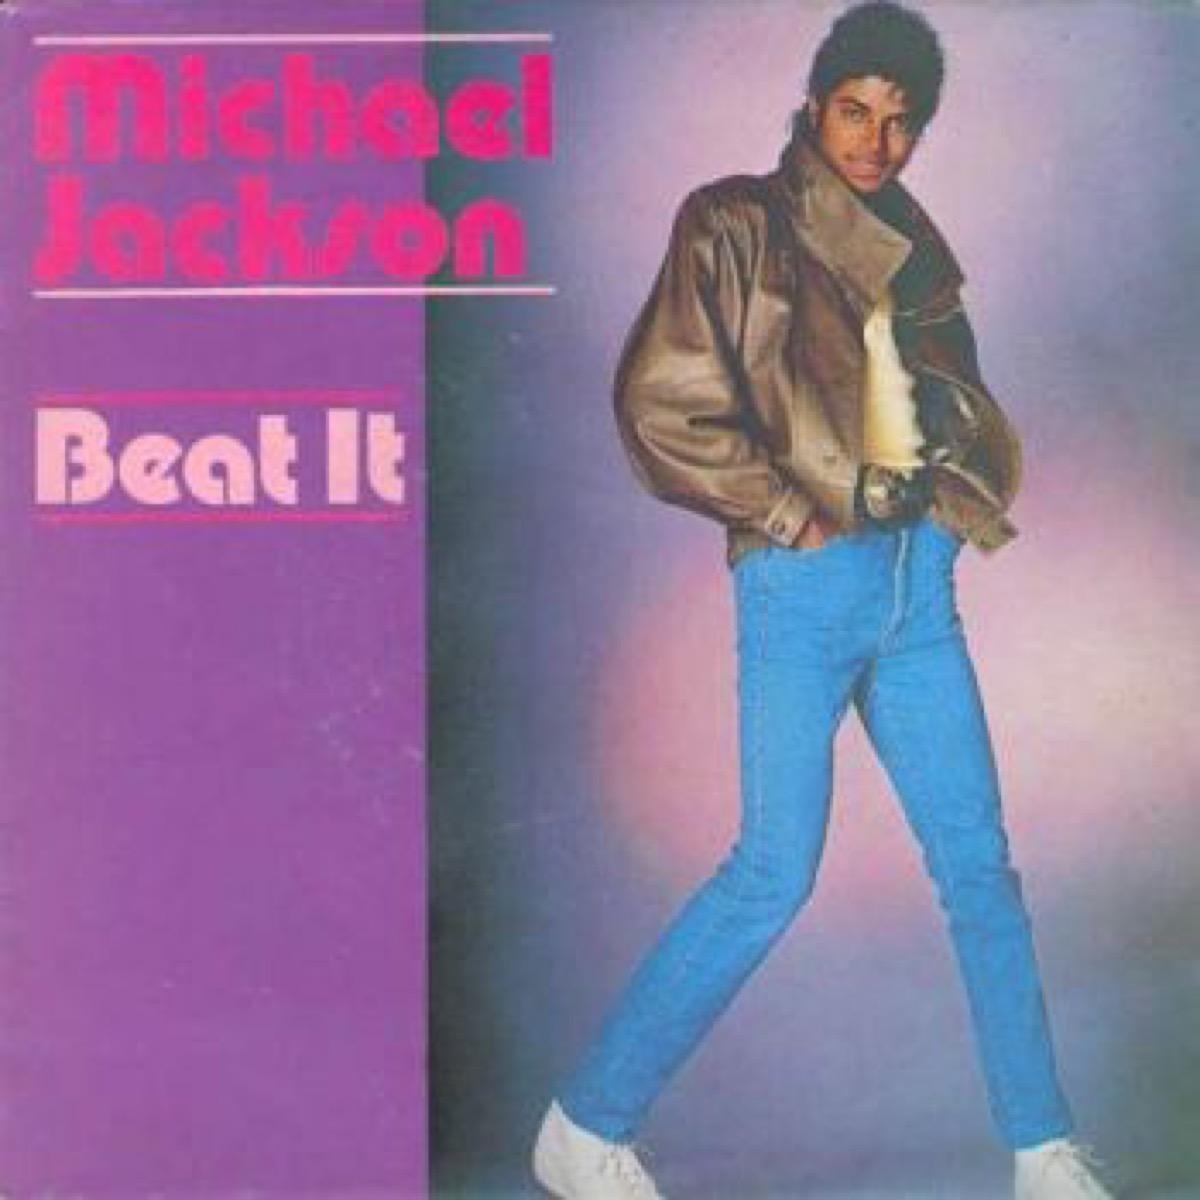 michael jackson beat it single cover